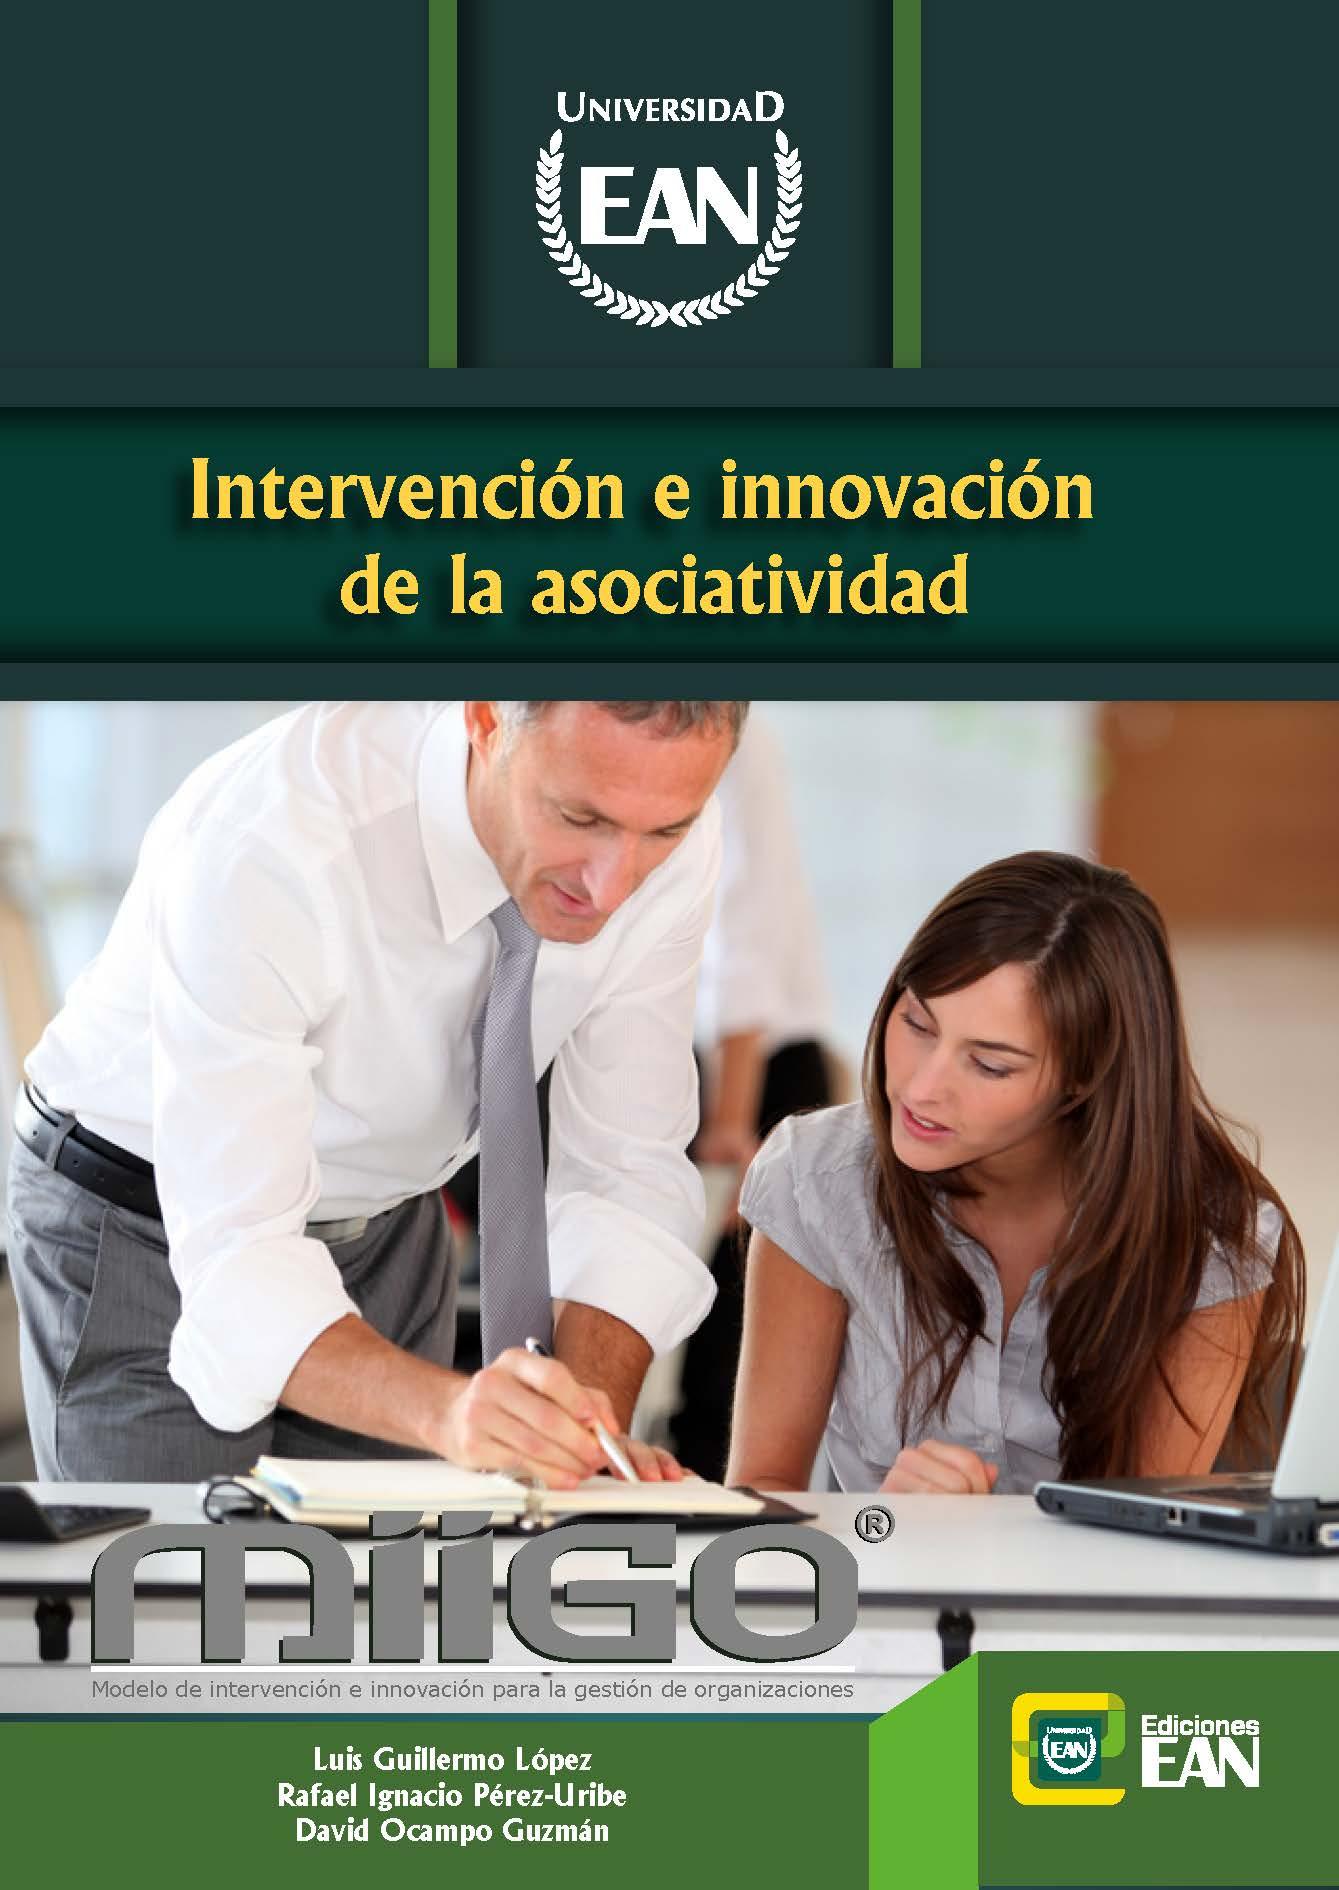 MIIGO- Intervención e innovación de la asociatividad